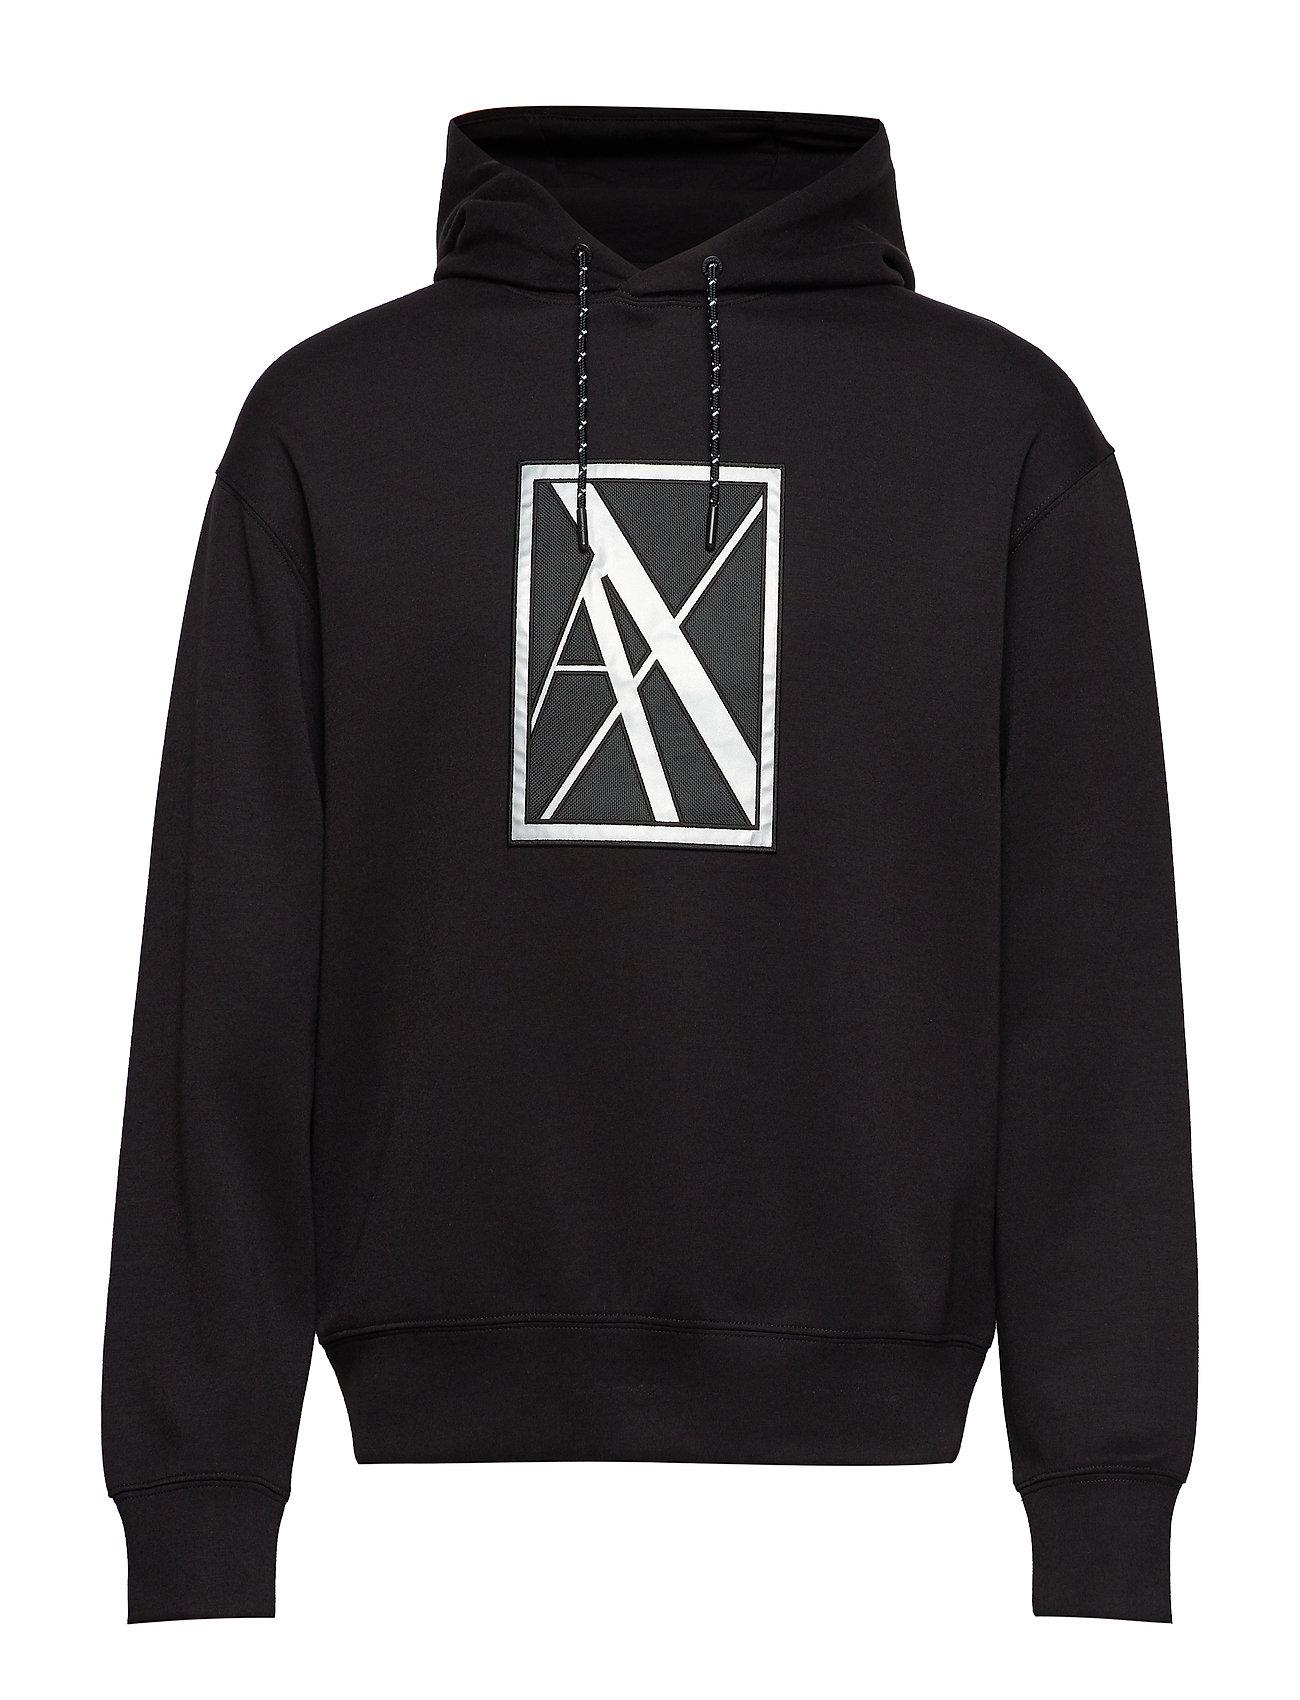 Man SweatshirtblackArmani Exchange Ax Ax Man Ax SweatshirtblackArmani Exchange Man u1J3TFlK5c